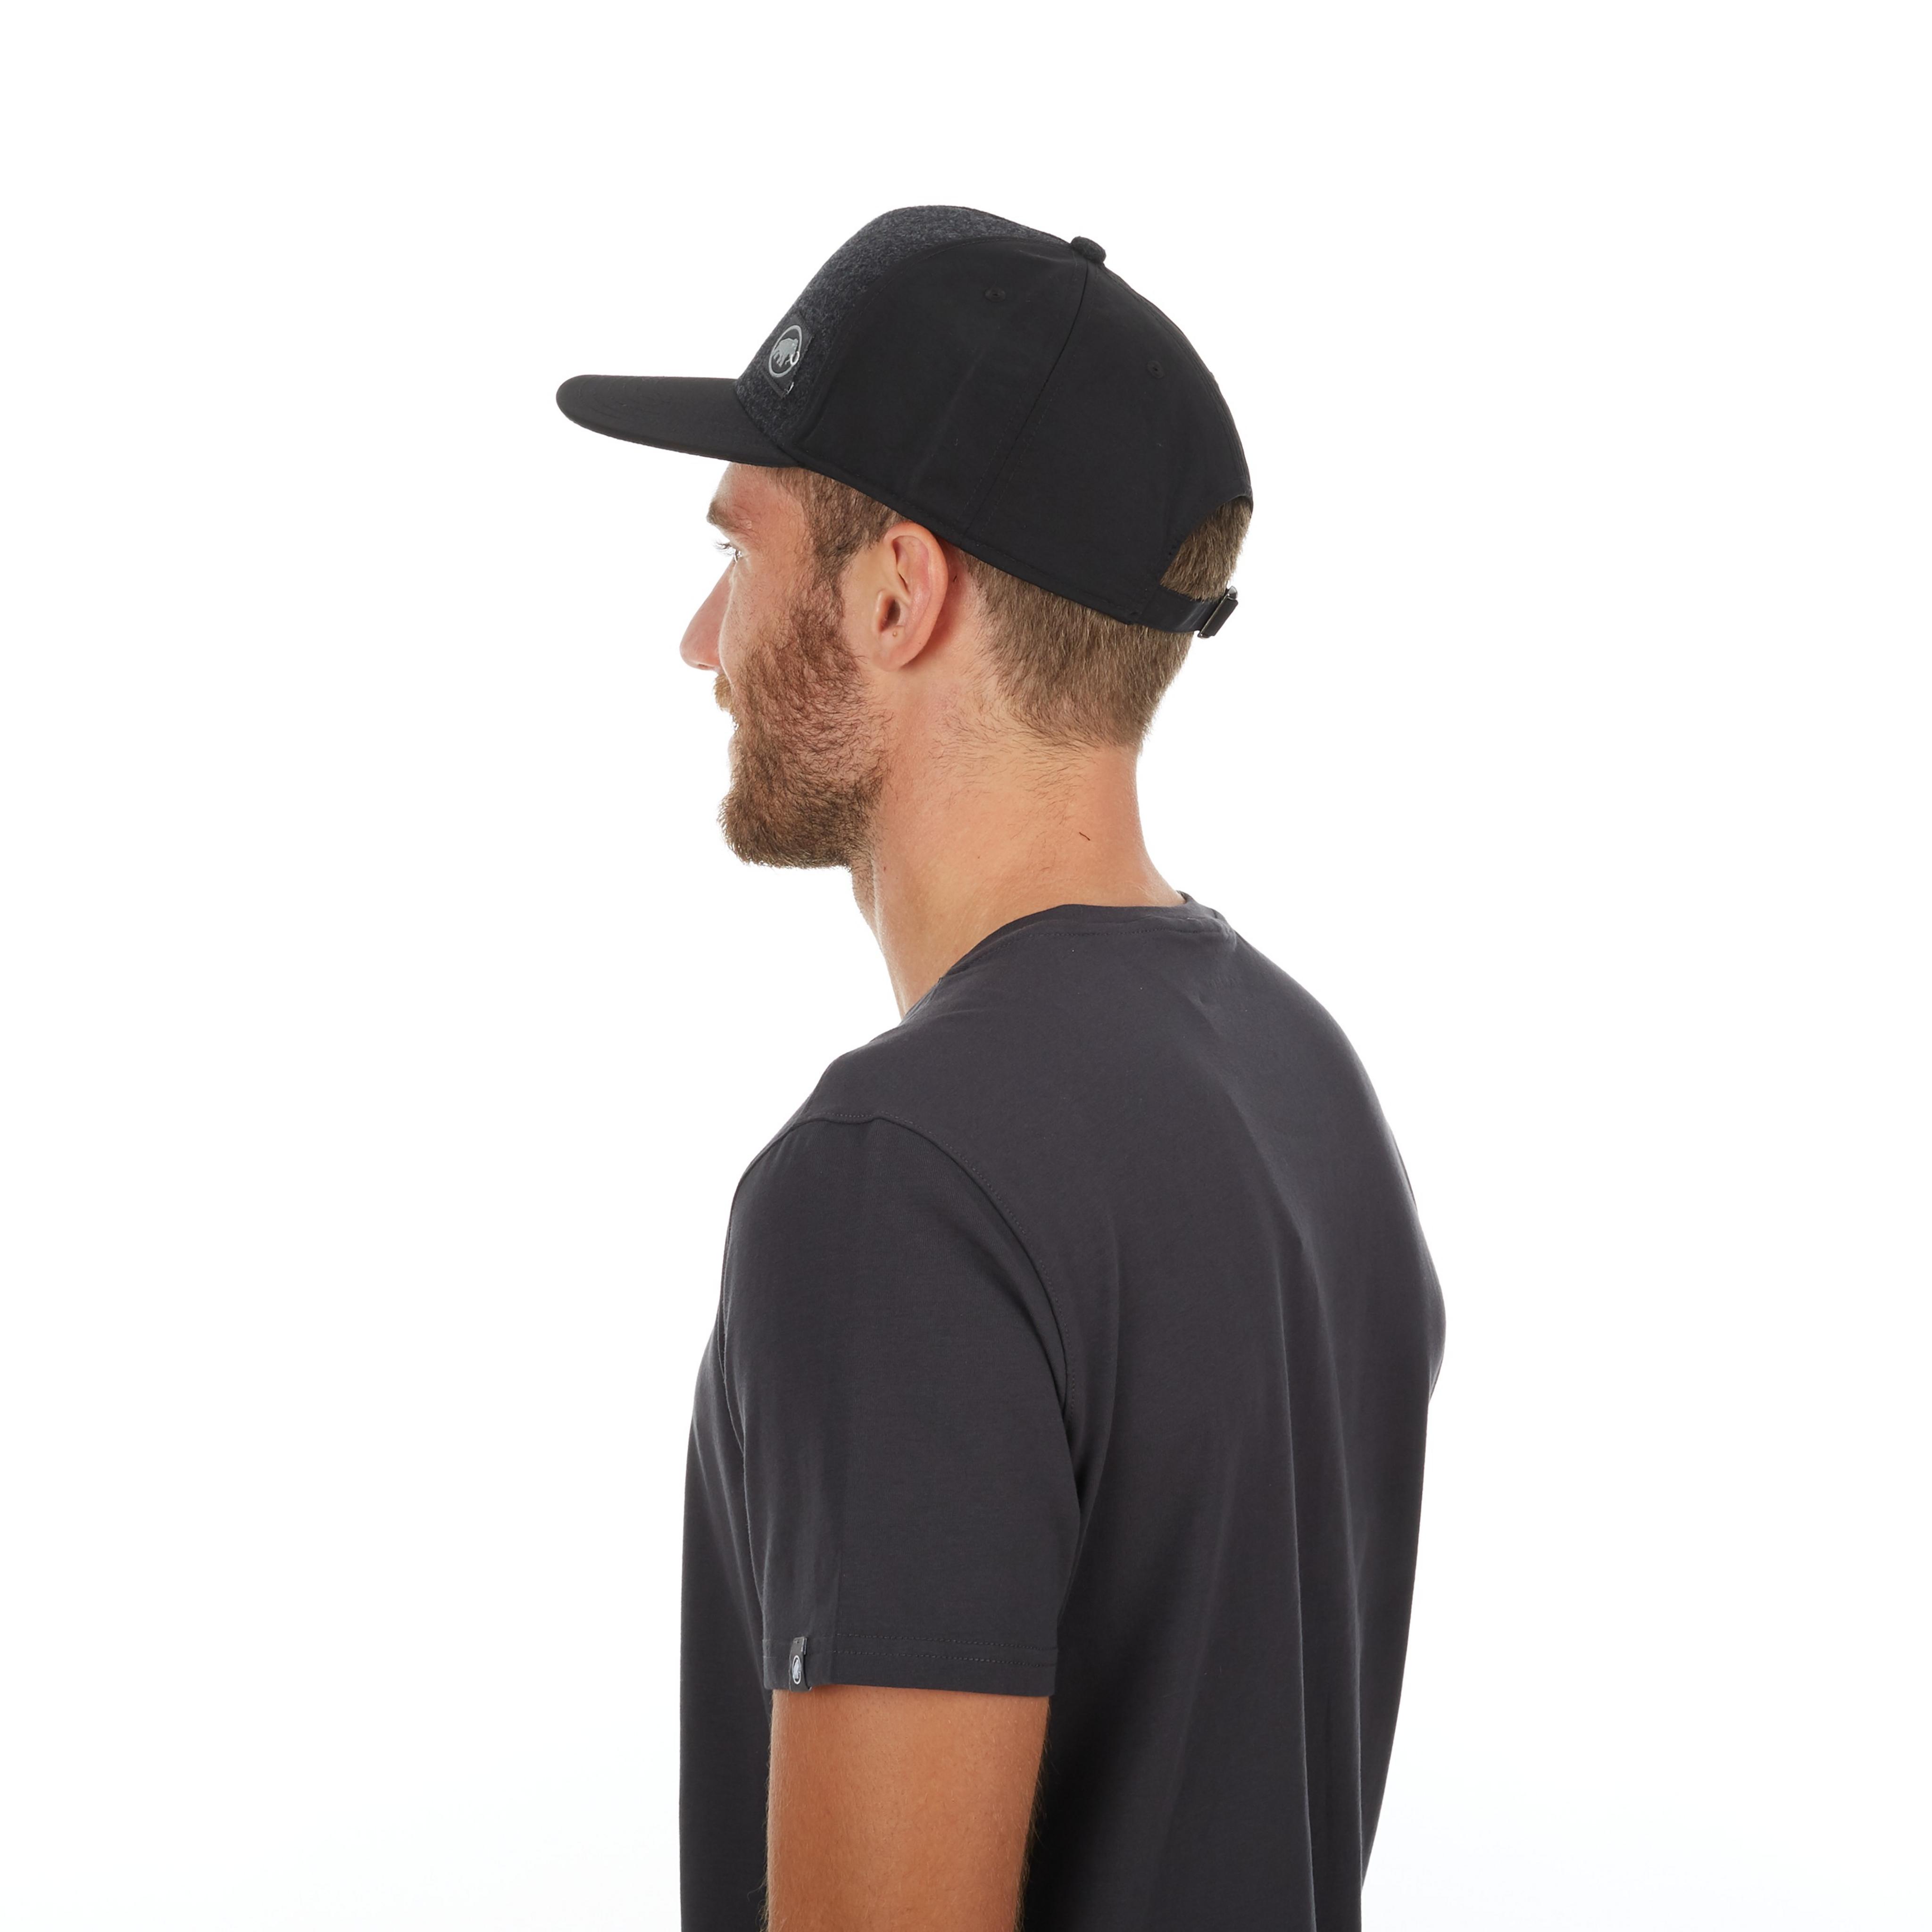 Alnasca Cap product image